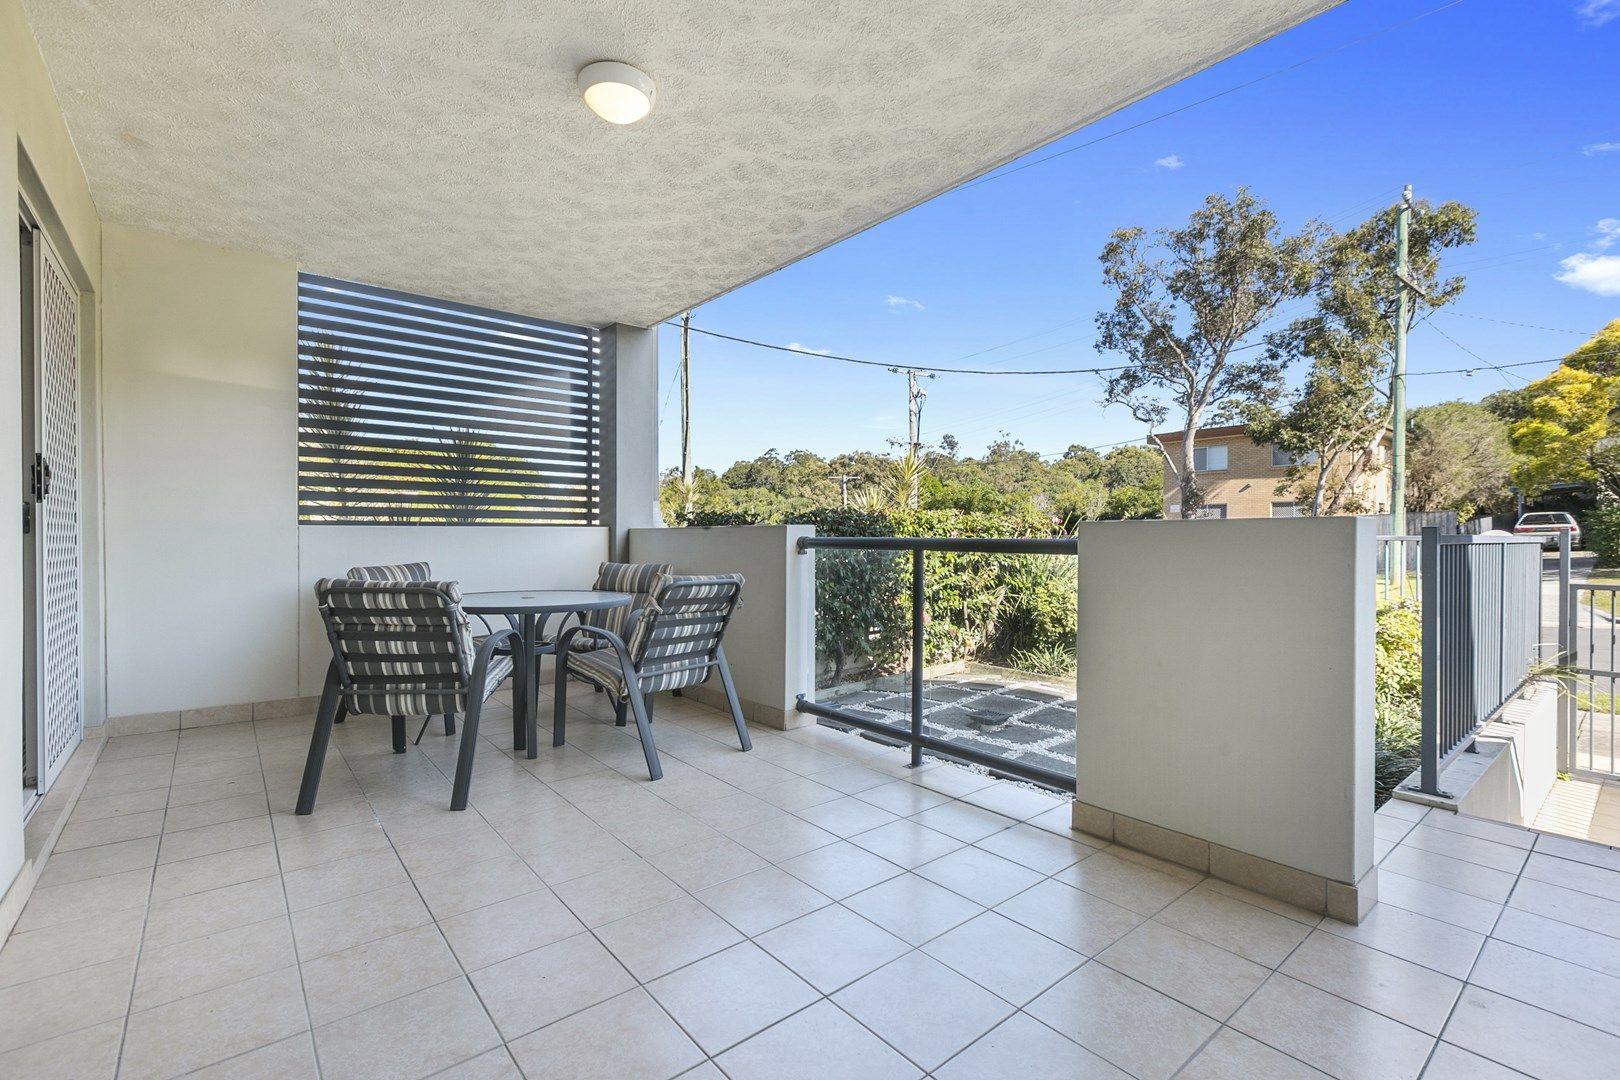 1/84 Tenby Street, Mount Gravatt QLD 4122, Image 0